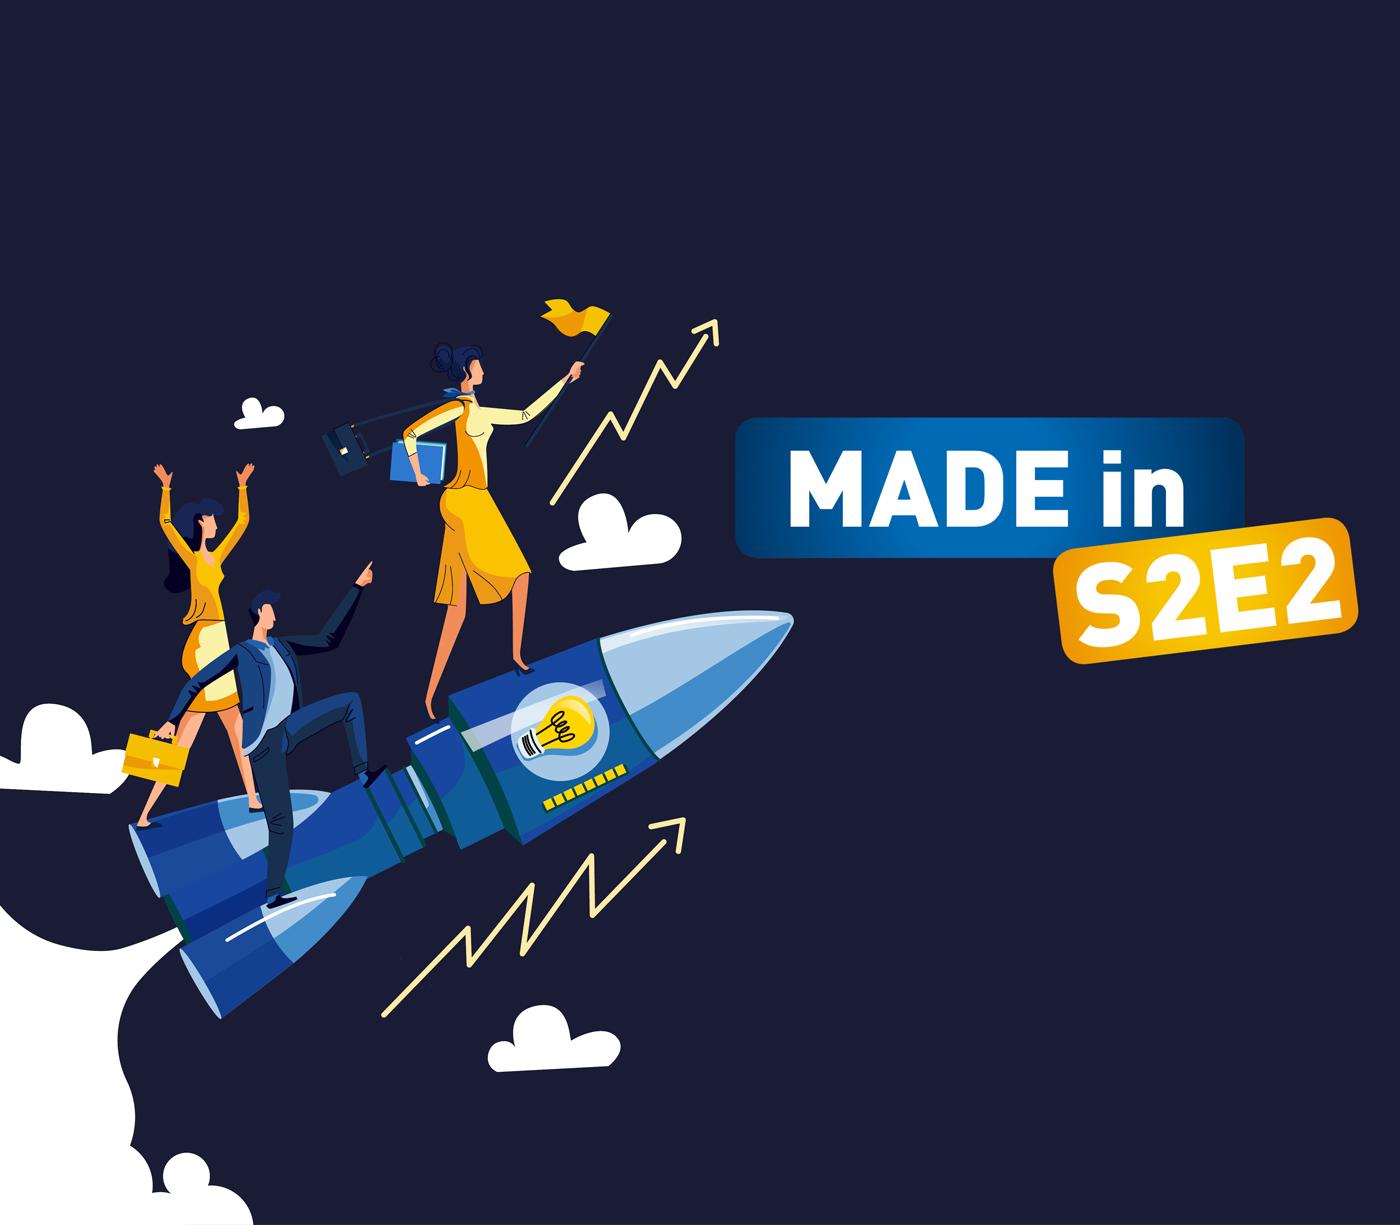 Made in S2E2 – première partie